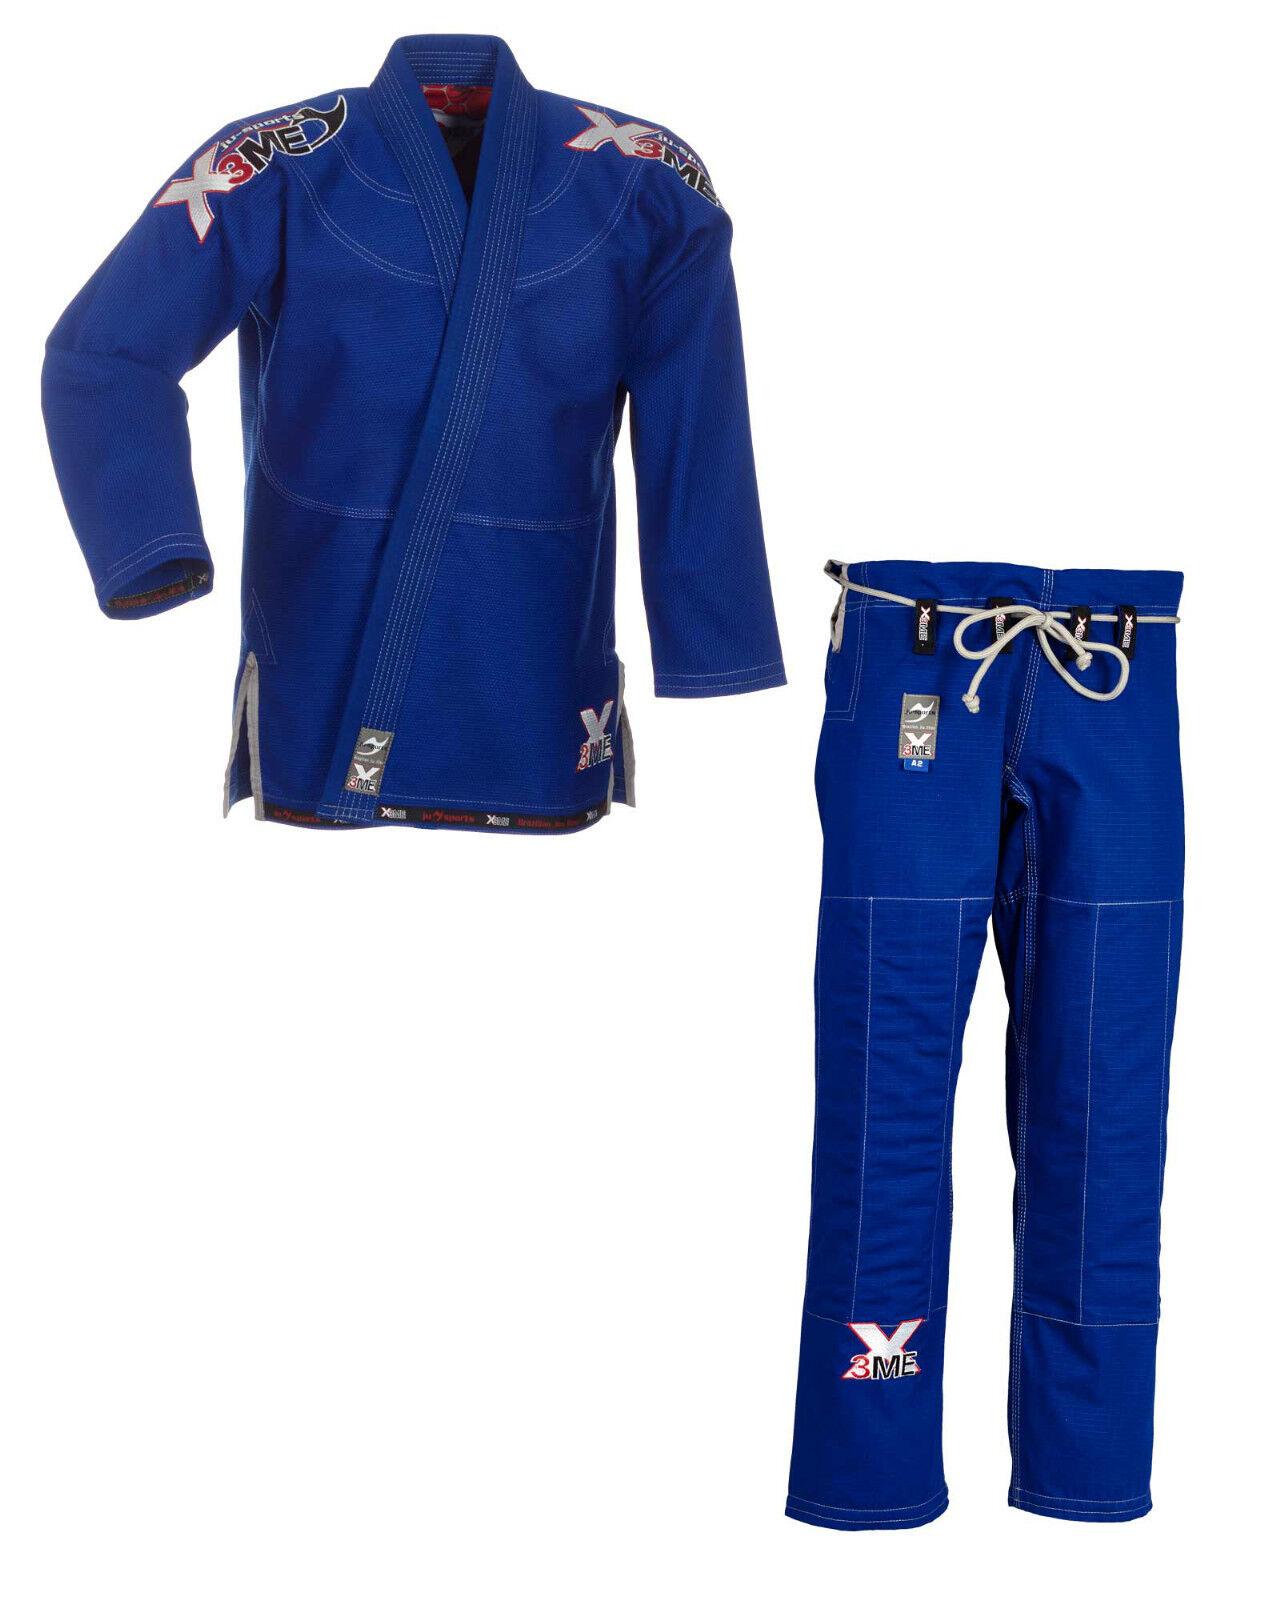 Ju-Sport-FDC-Suit  Extreme Blau 2.0  Brazilian Jiu-Jitsu.a1-a6. very High Quality